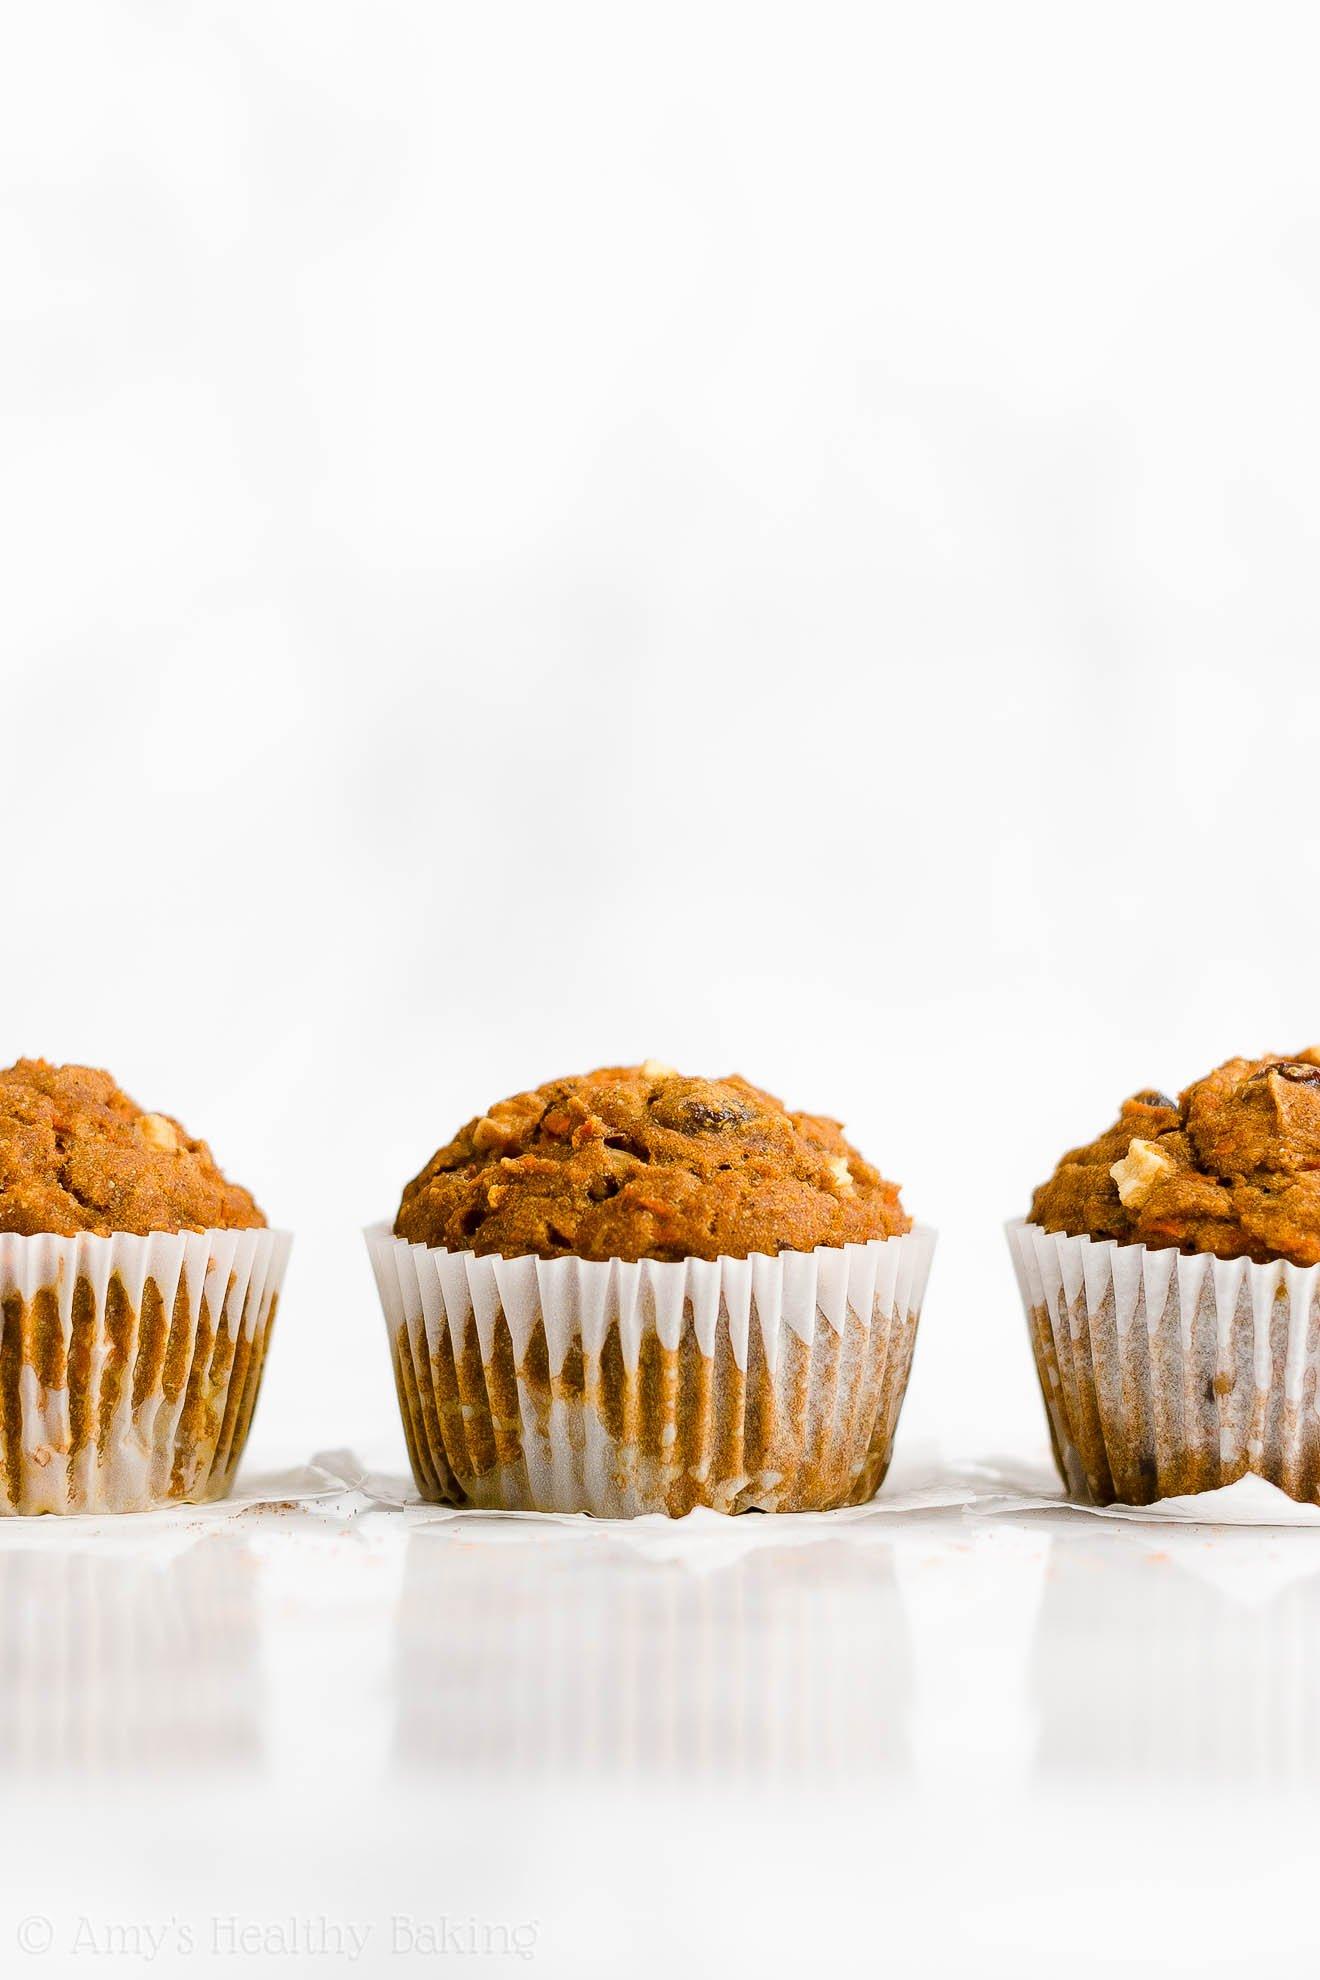 Best Easy Healthy Weight Watchers No Sugar Pumpkin Morning Glory Muffins